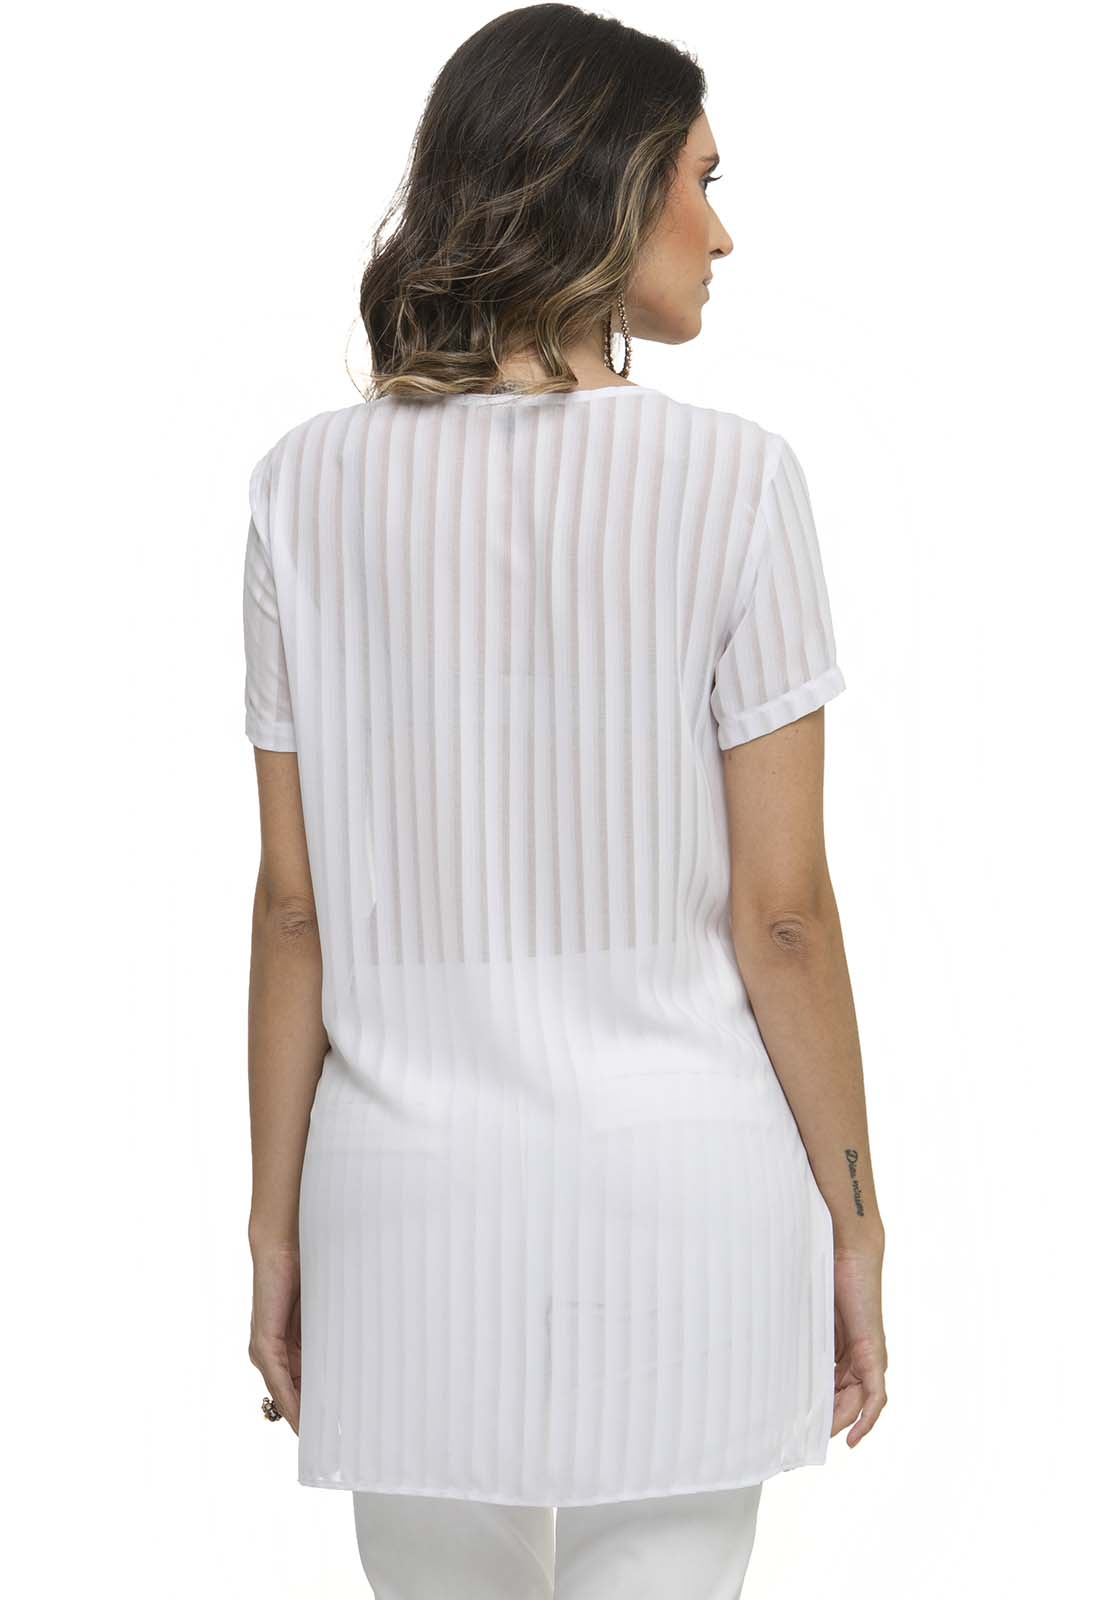 T Shirt Zaiko Over Stripes 2404